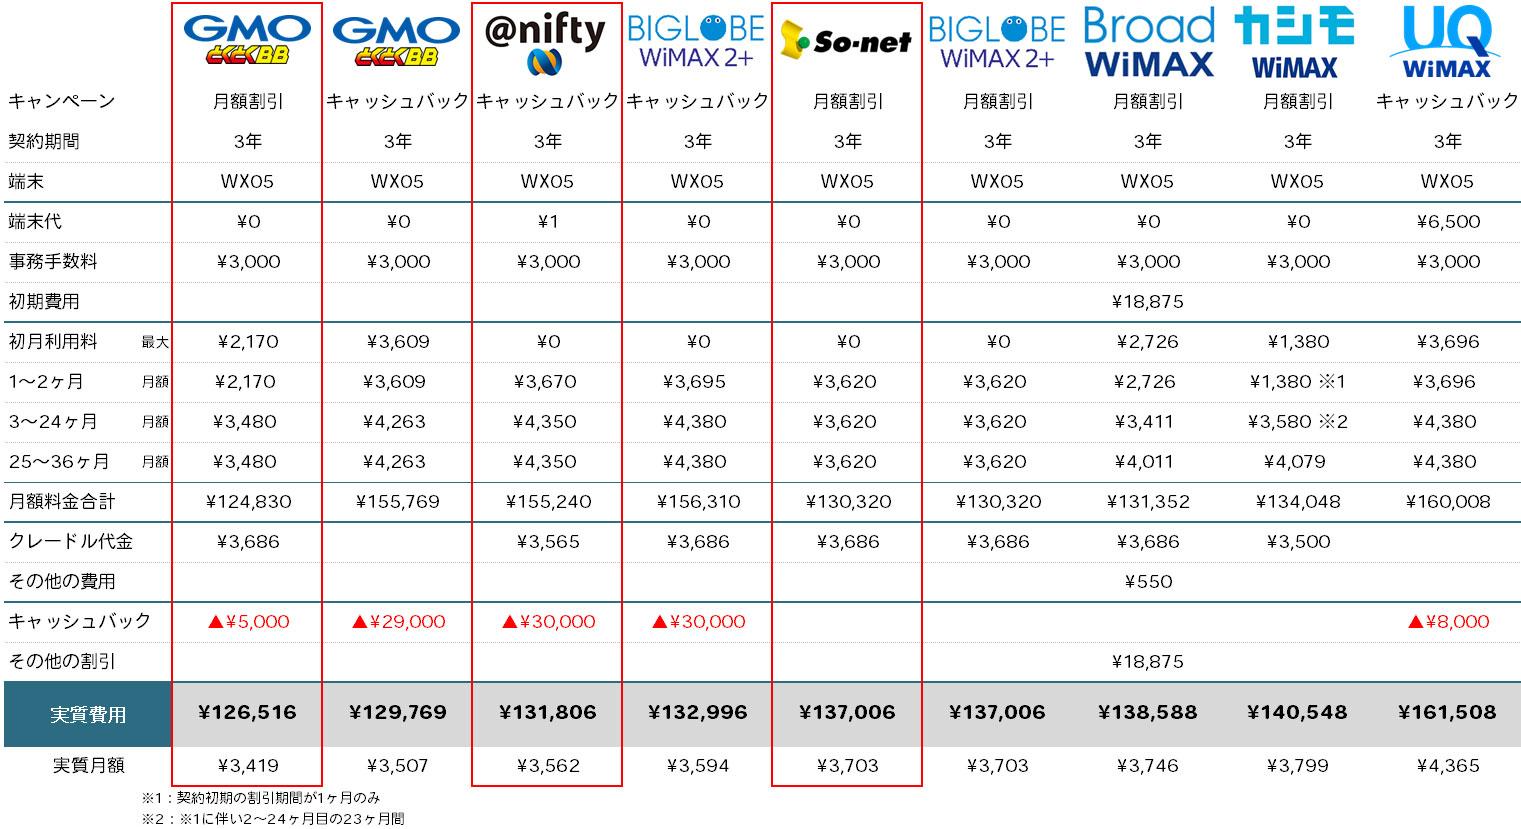 WX05+クレードル 販売店比較